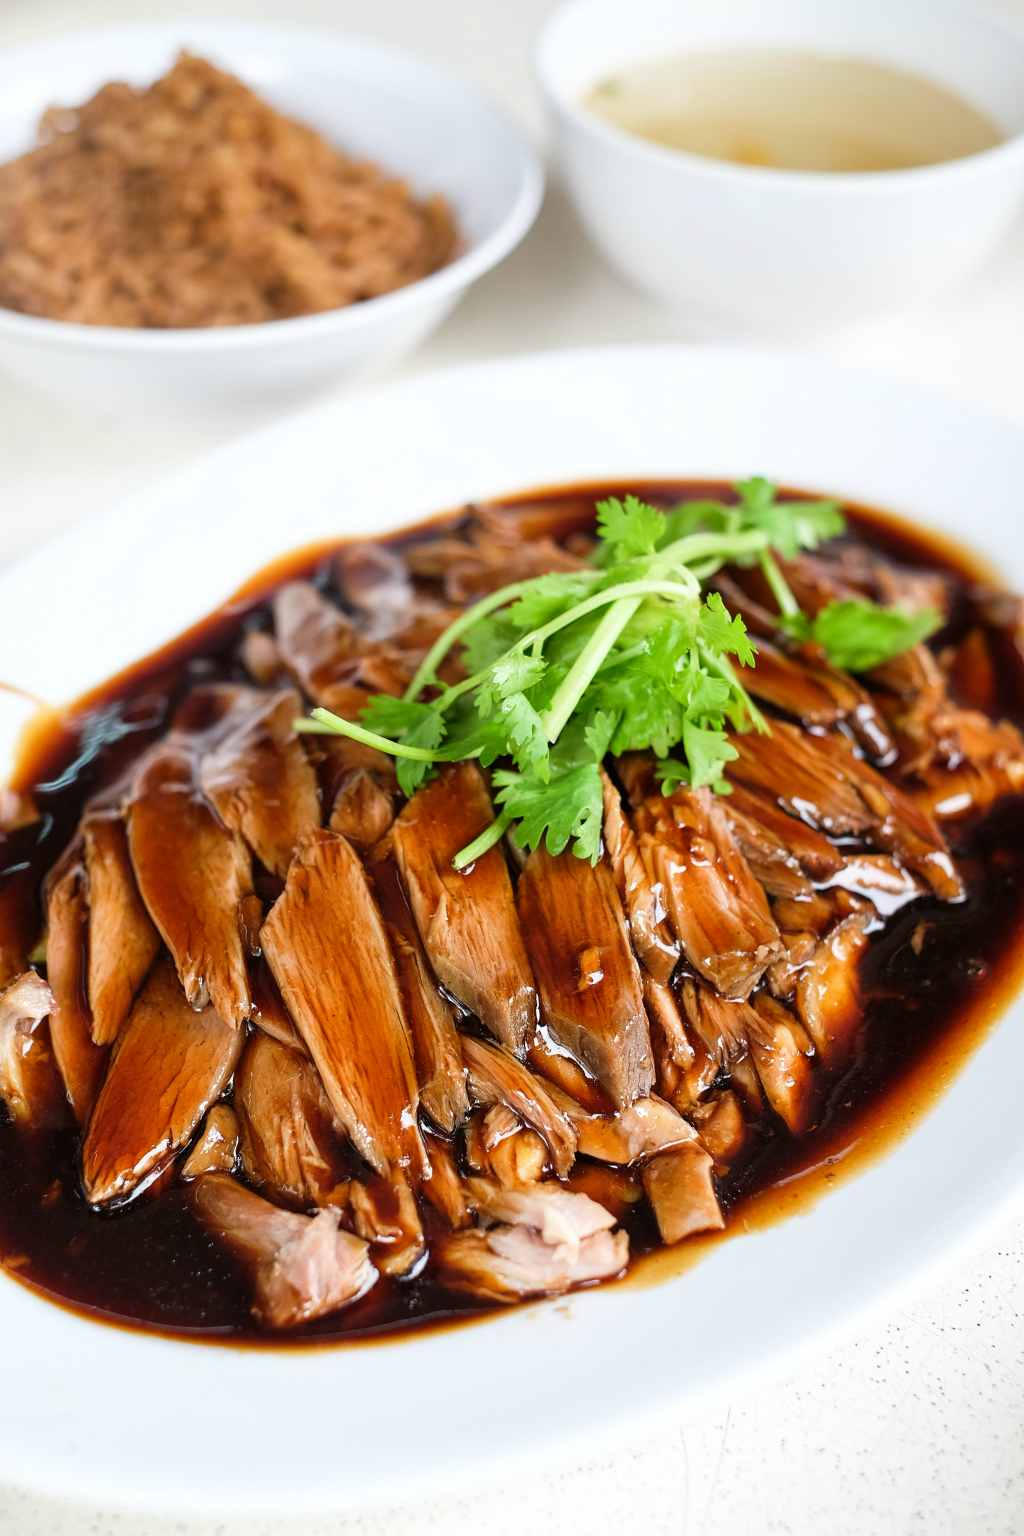 South Buona Vista Duck Rice